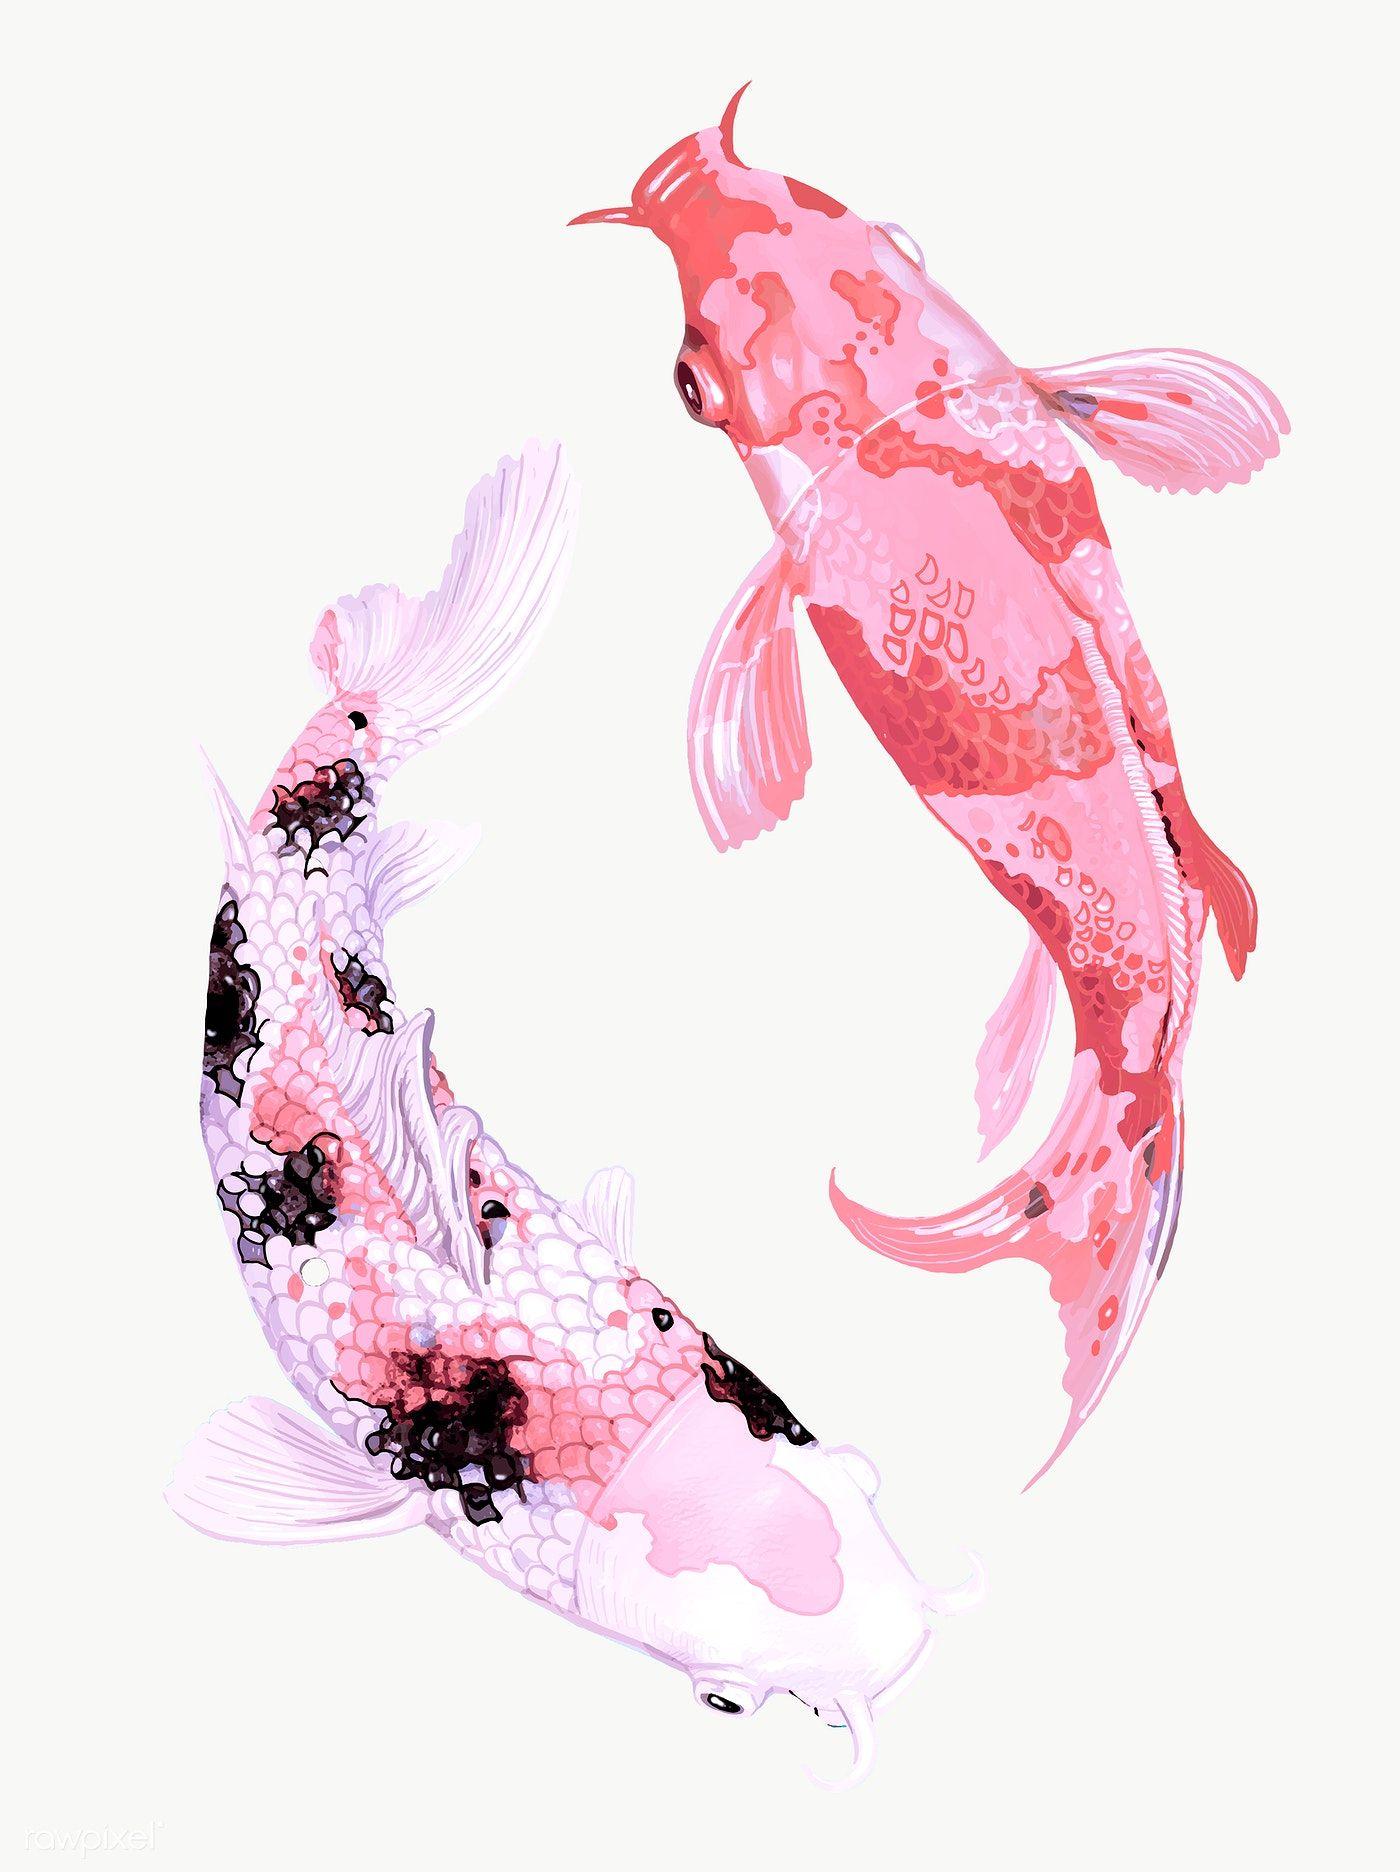 Two Japanese Koi Fish Swimming Transparent Png Premium Image By Rawpixel Com Techi Koi Fish Drawing Japanese Koi Fish Tattoo Japanese Koi